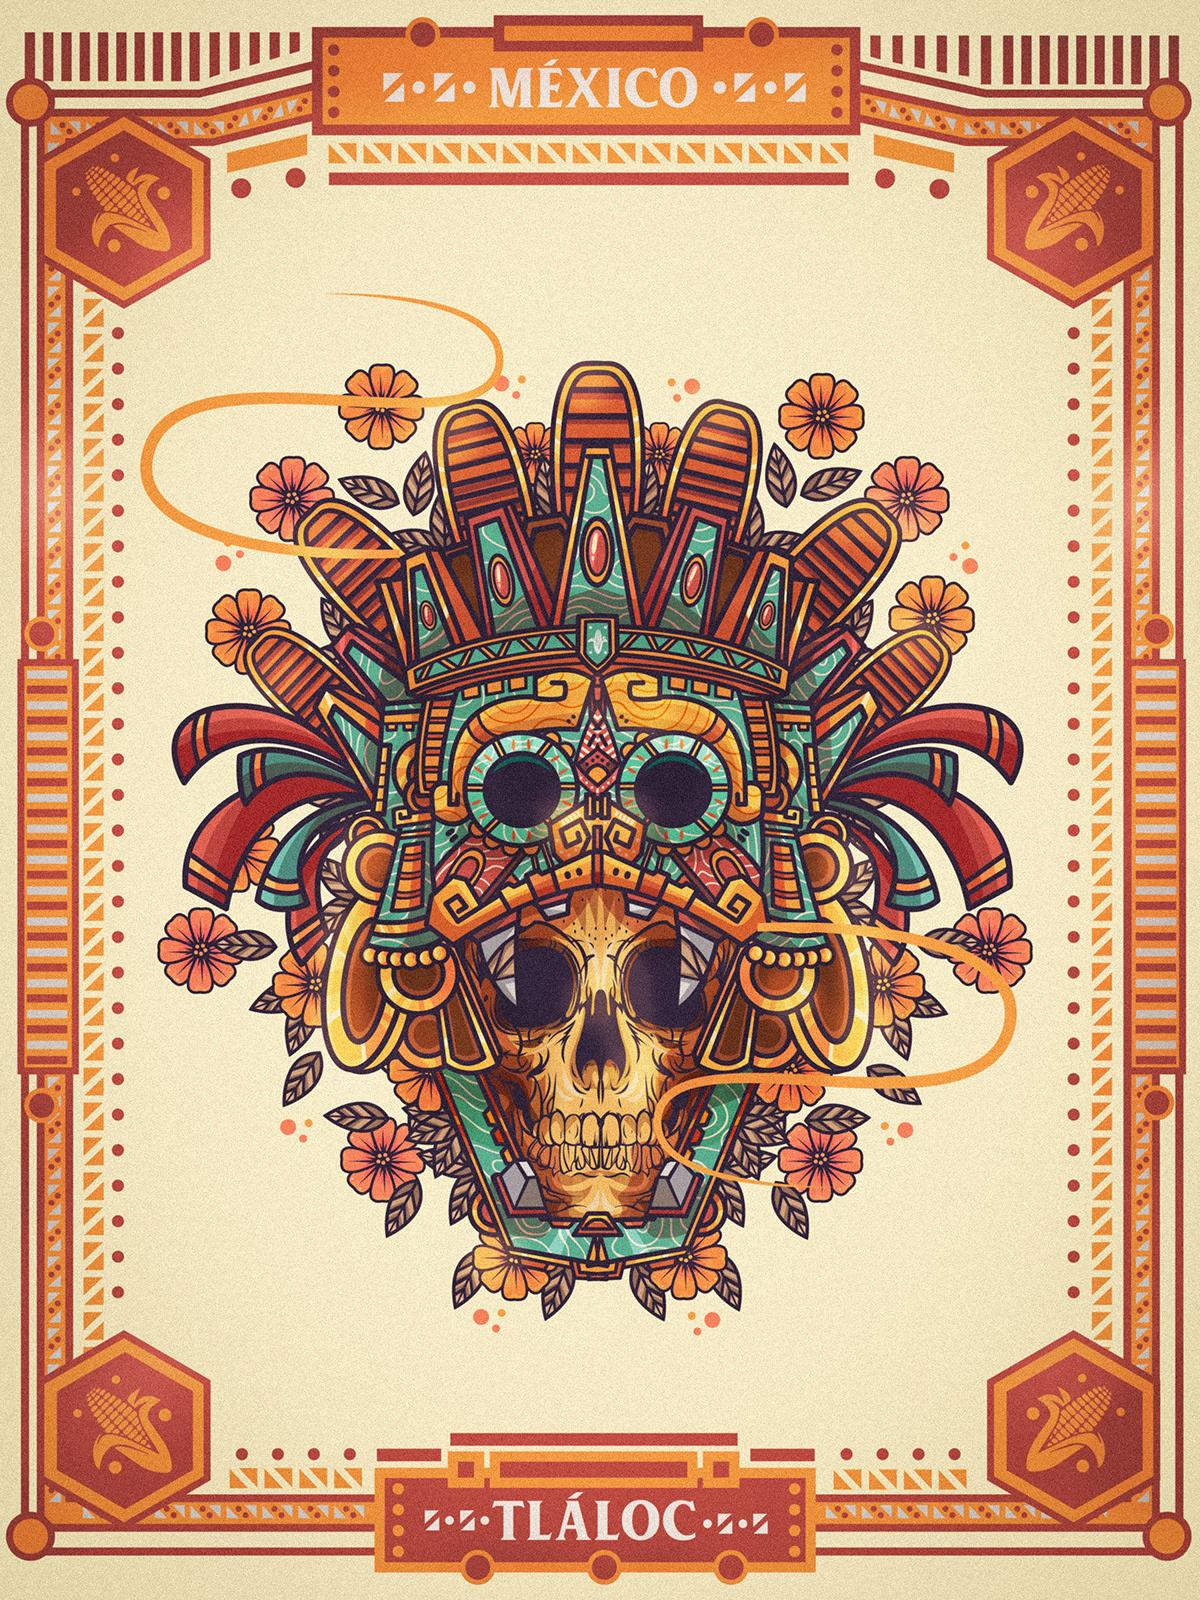 Mexico Real by Pequeño Capitan